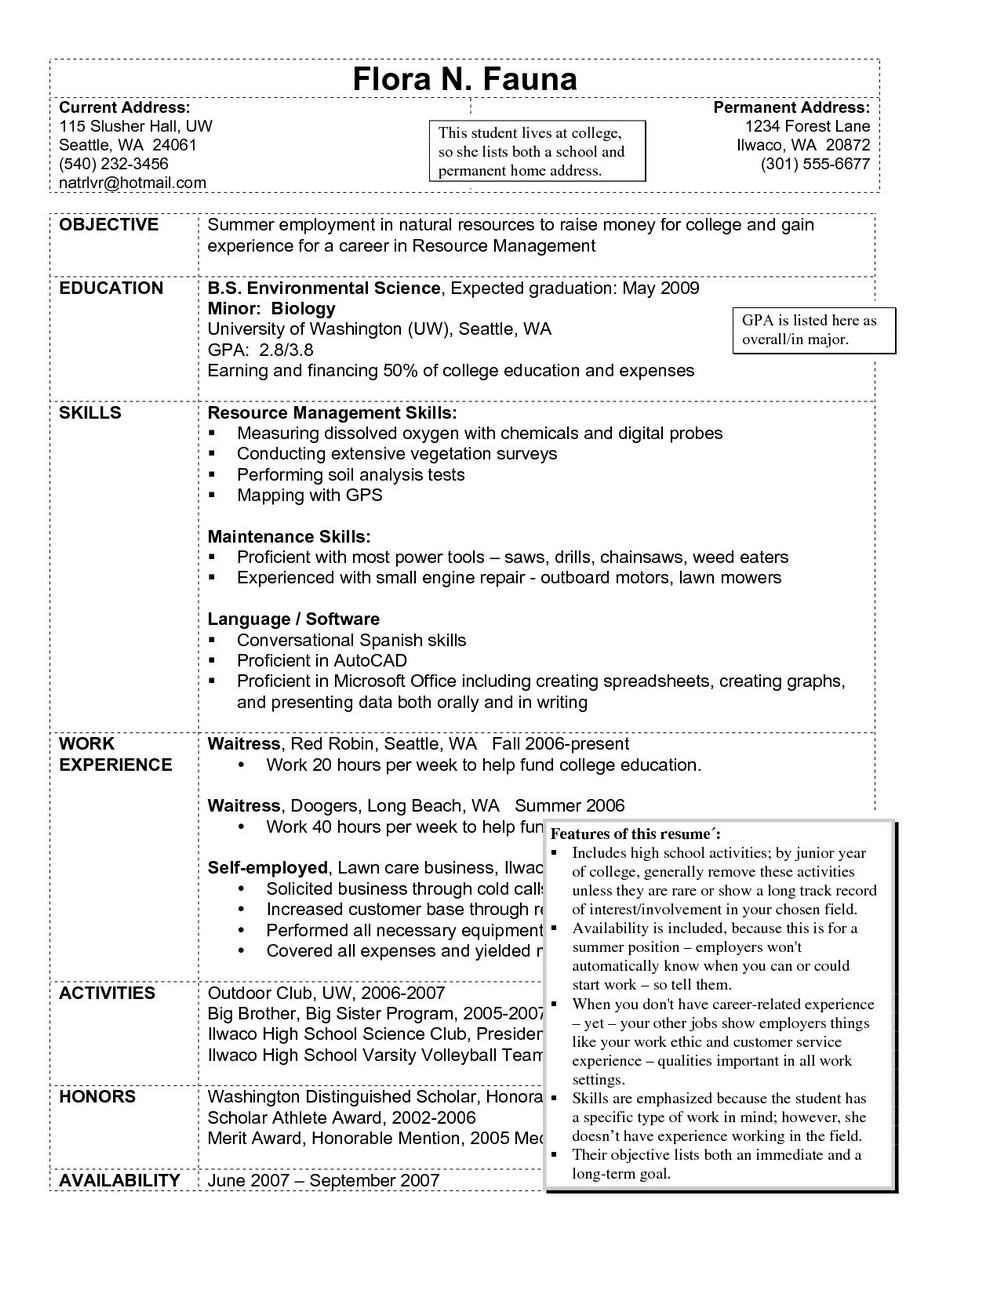 Resume For Hotel Housekeeping Job